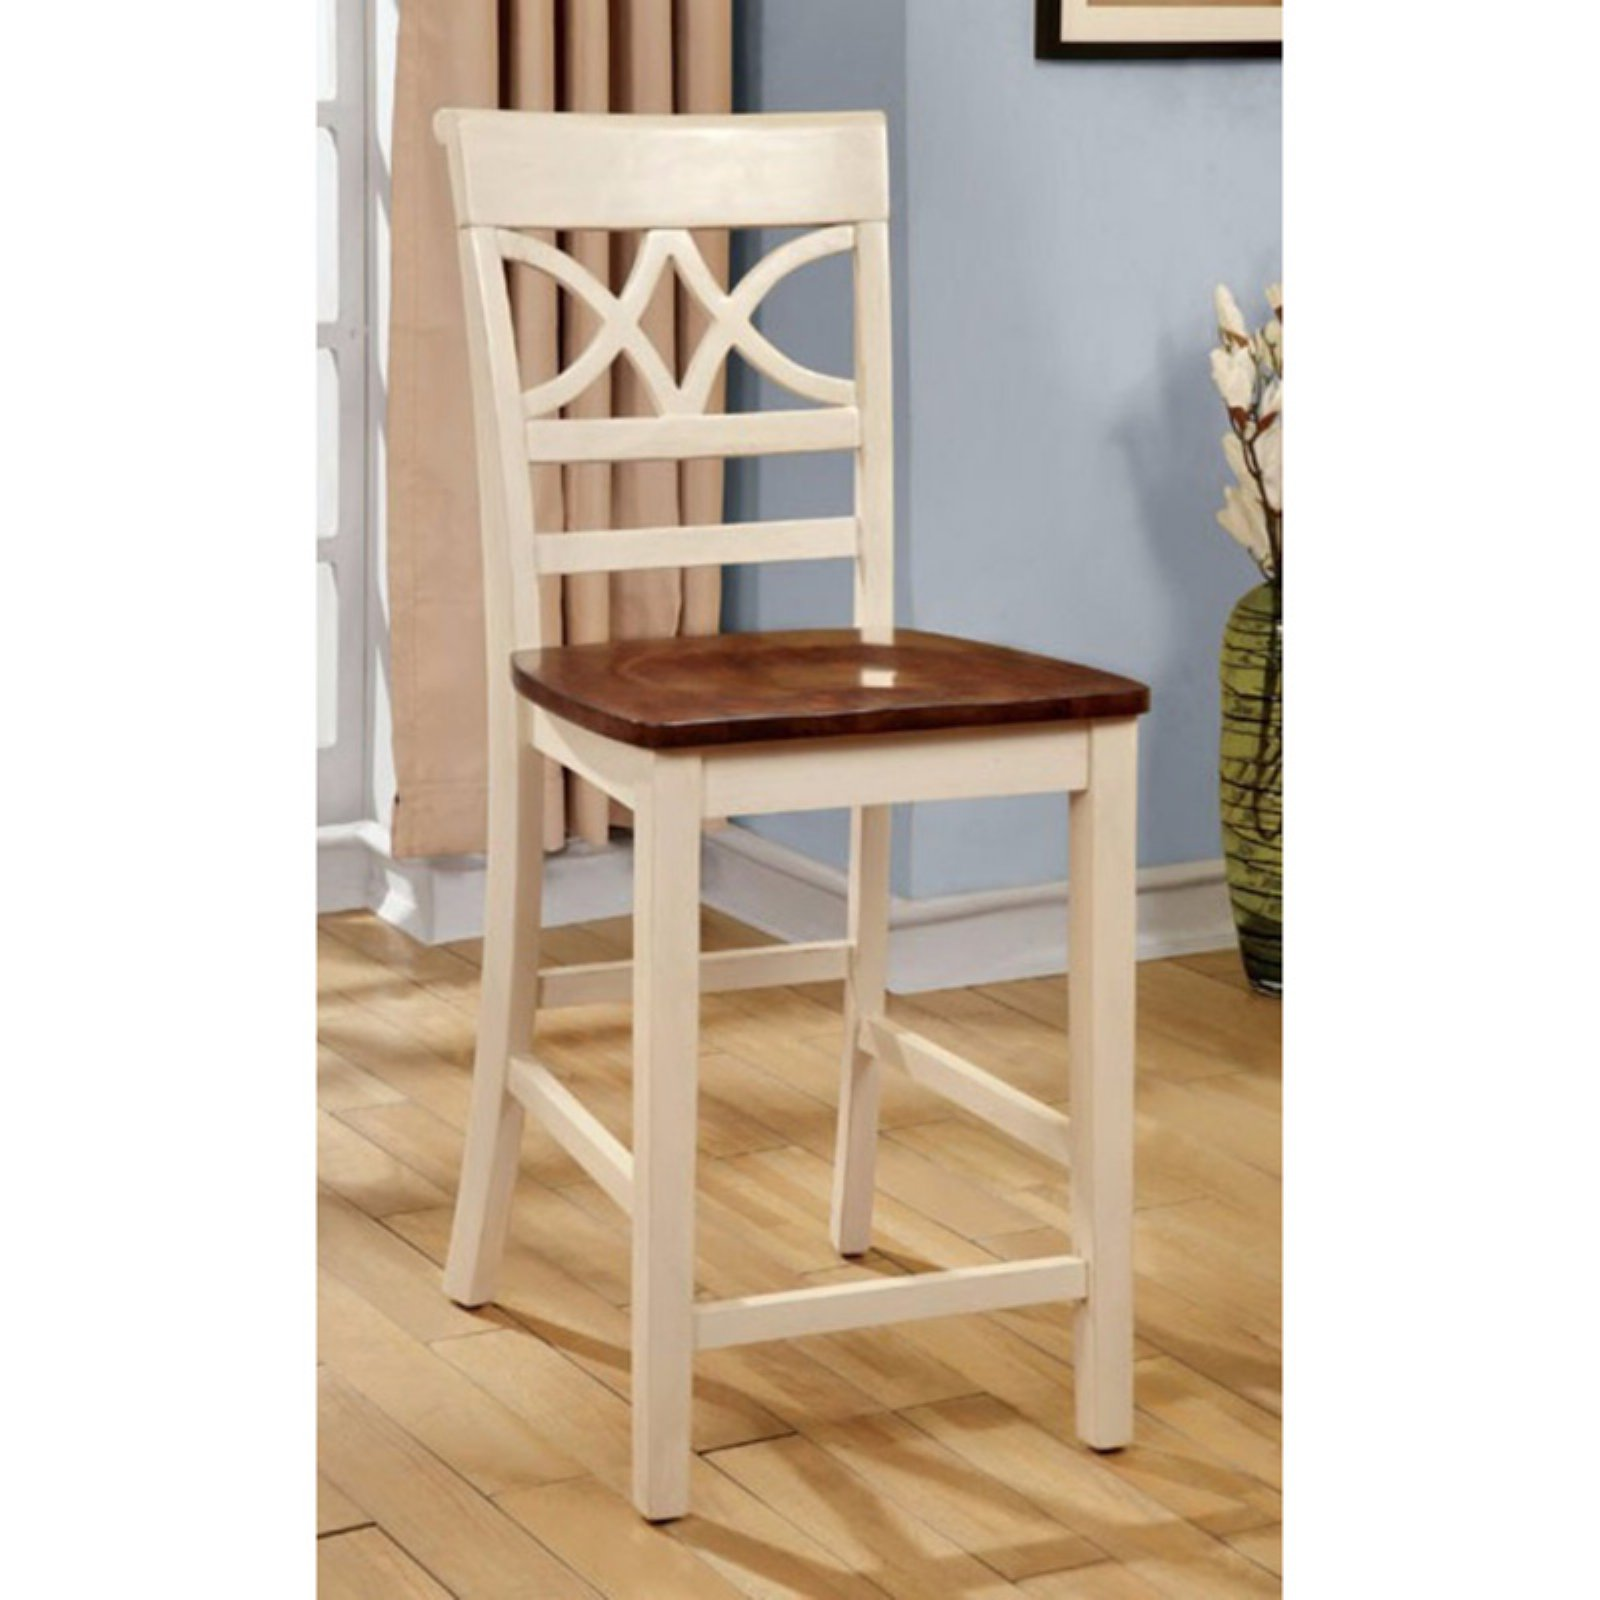 Torrington II Counter Height Chair, Vintage White & Cherry, Set Of 2